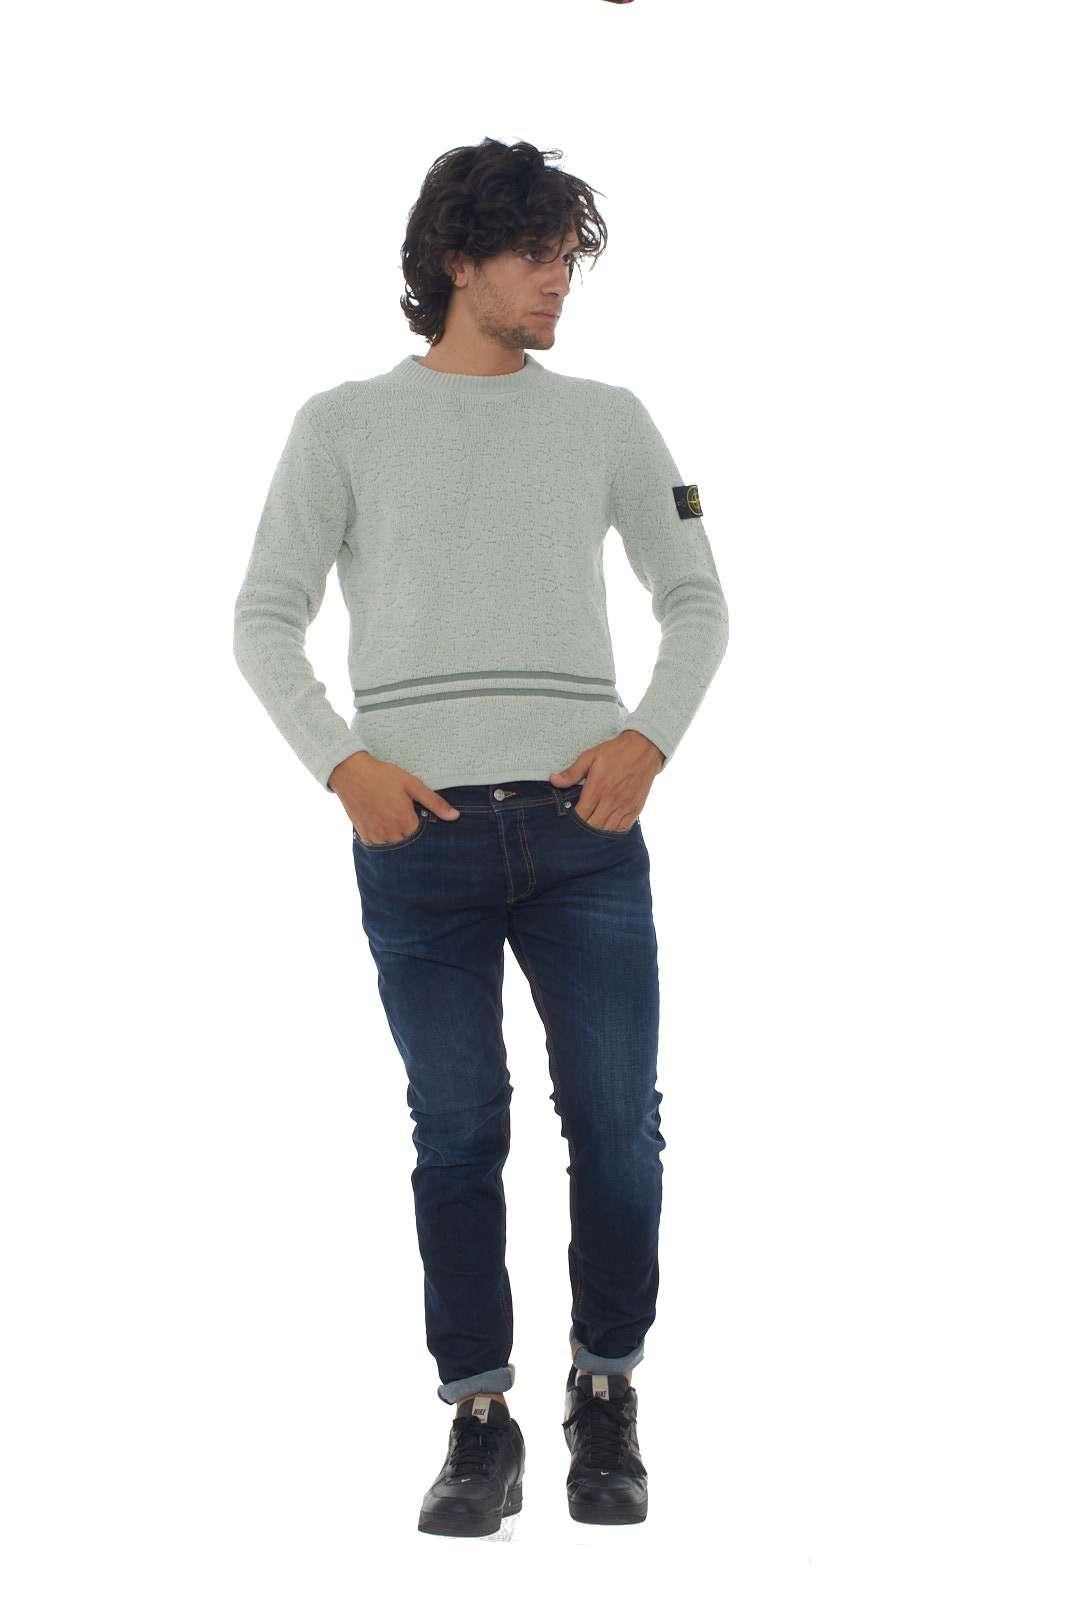 https://www.parmax.com/media/catalog/product/a/i/AI-outlet_parmax-maglia-uomo-Stone-Island-7115517B1-D.jpg